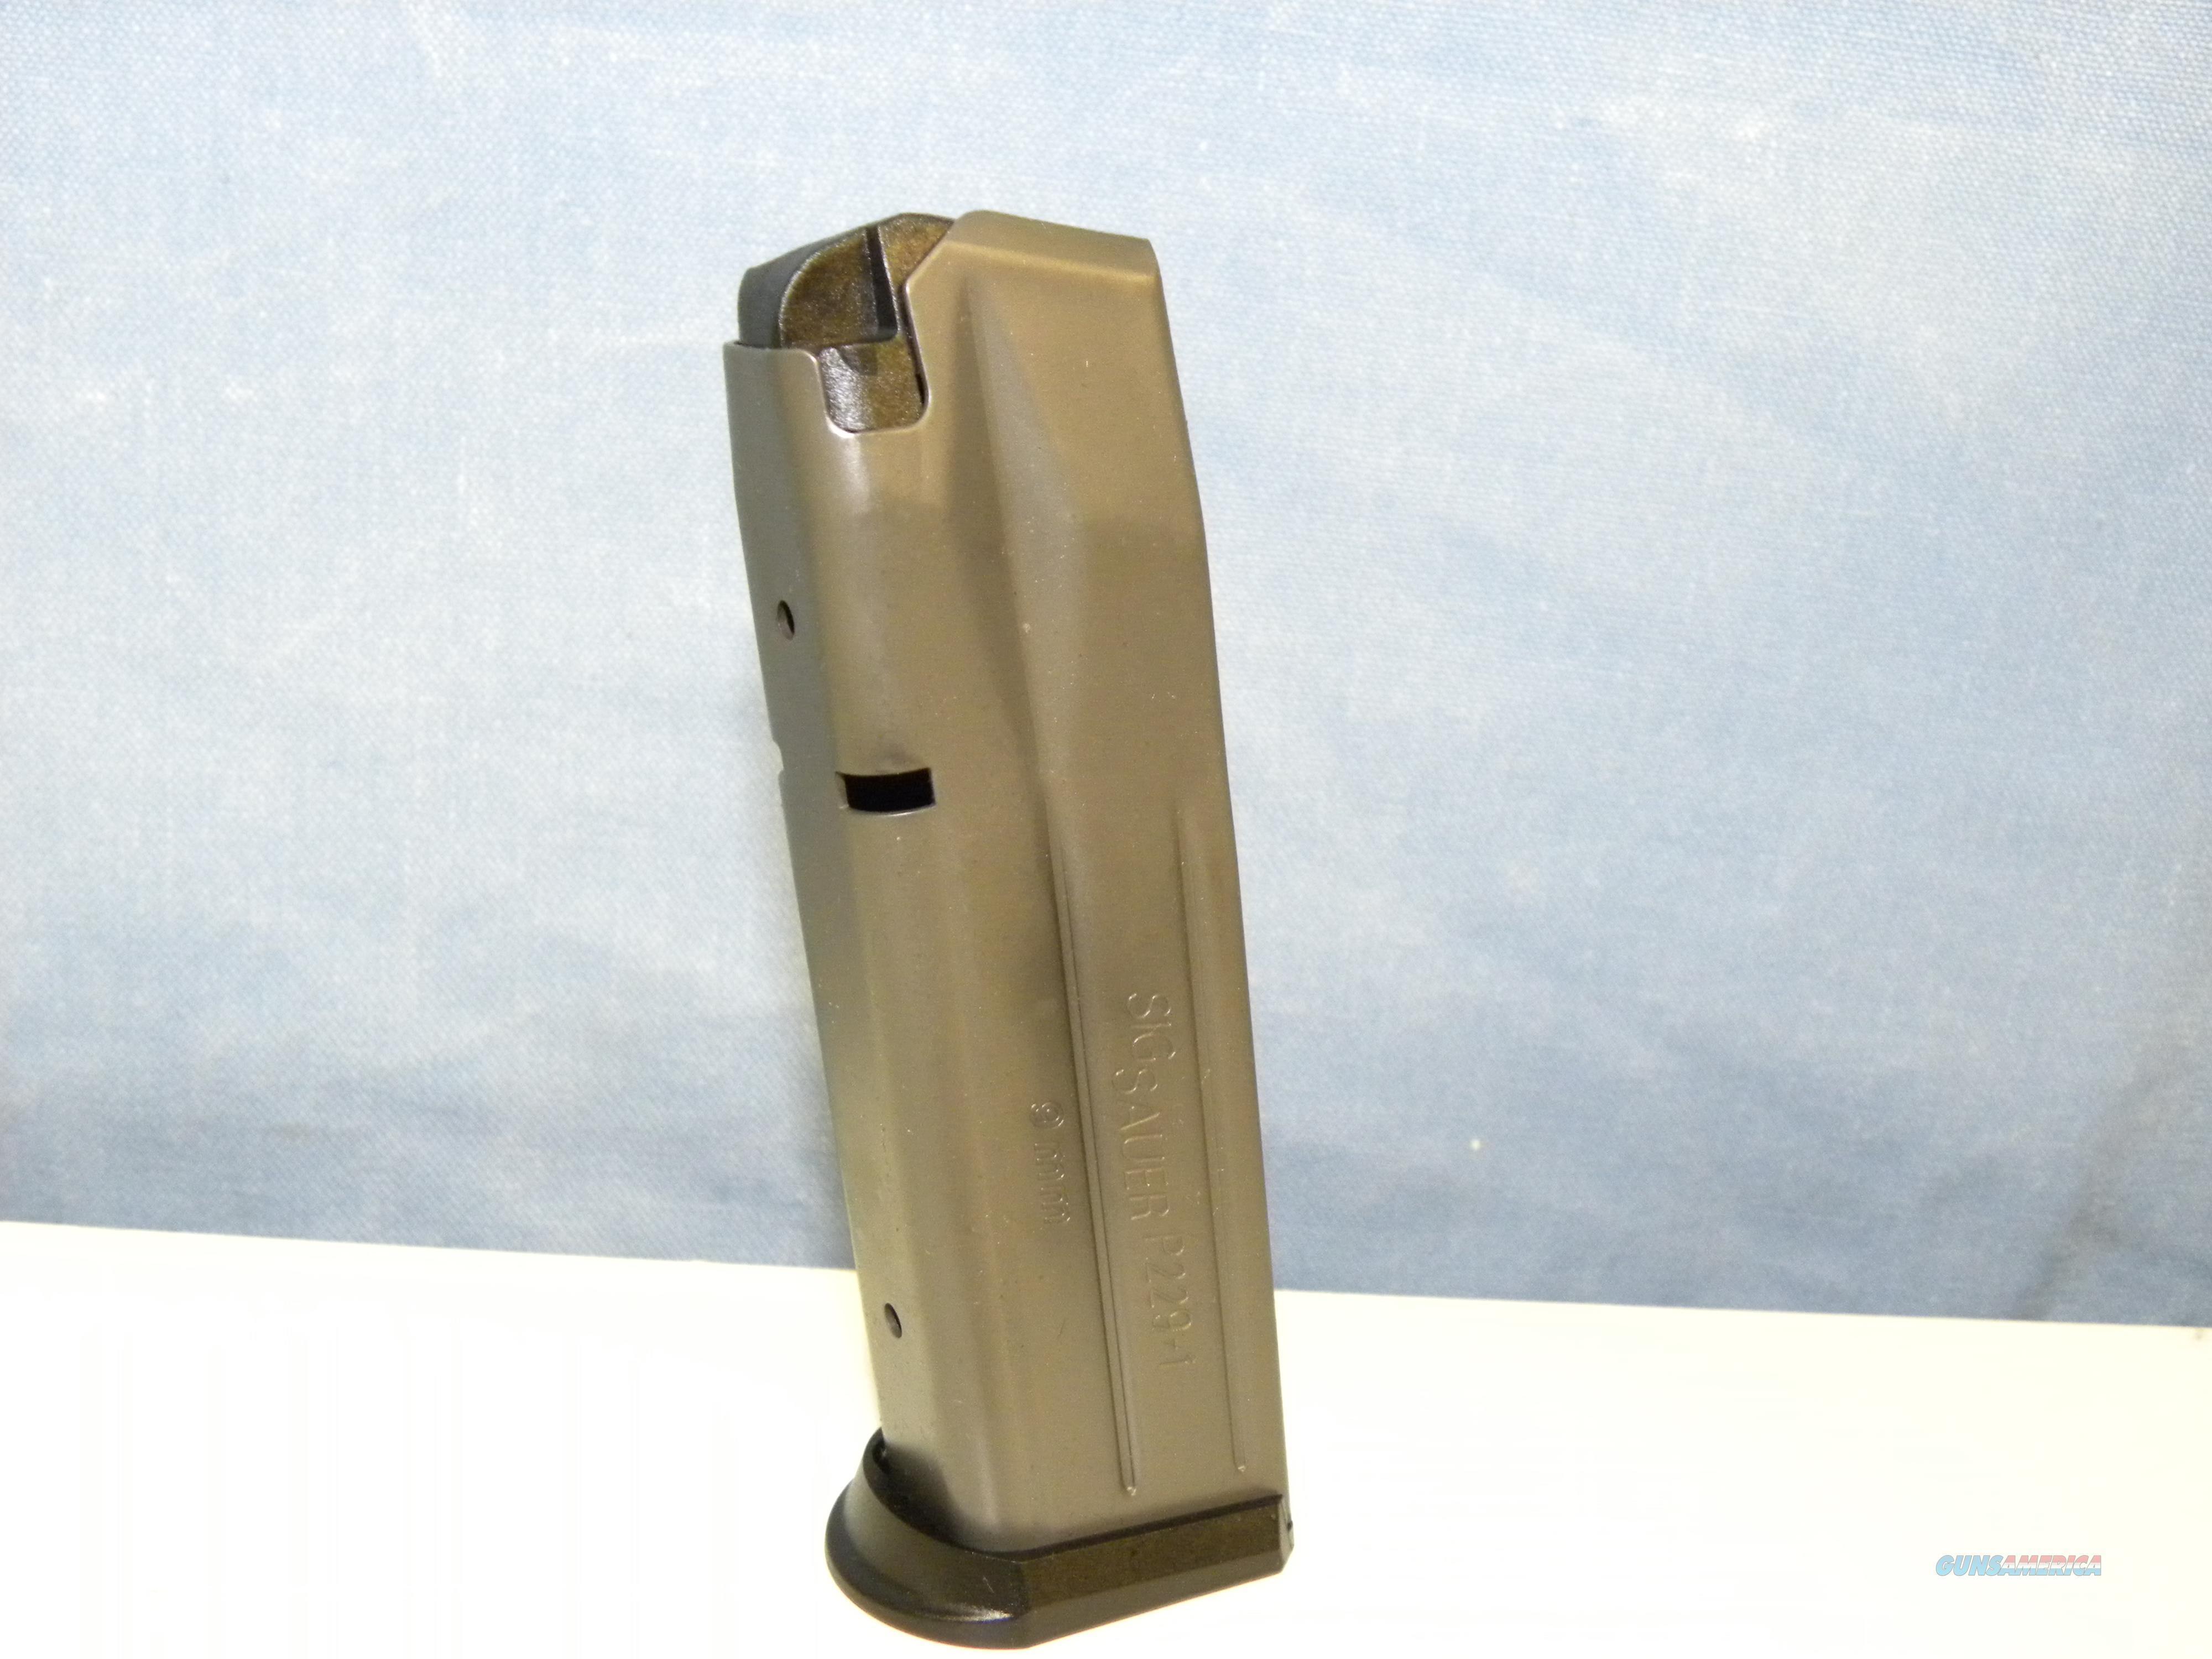 Sig Sauer 229 9mm Magazine 15 RD   Non-Guns > Magazines & Clips > Pistol Magazines > Sig